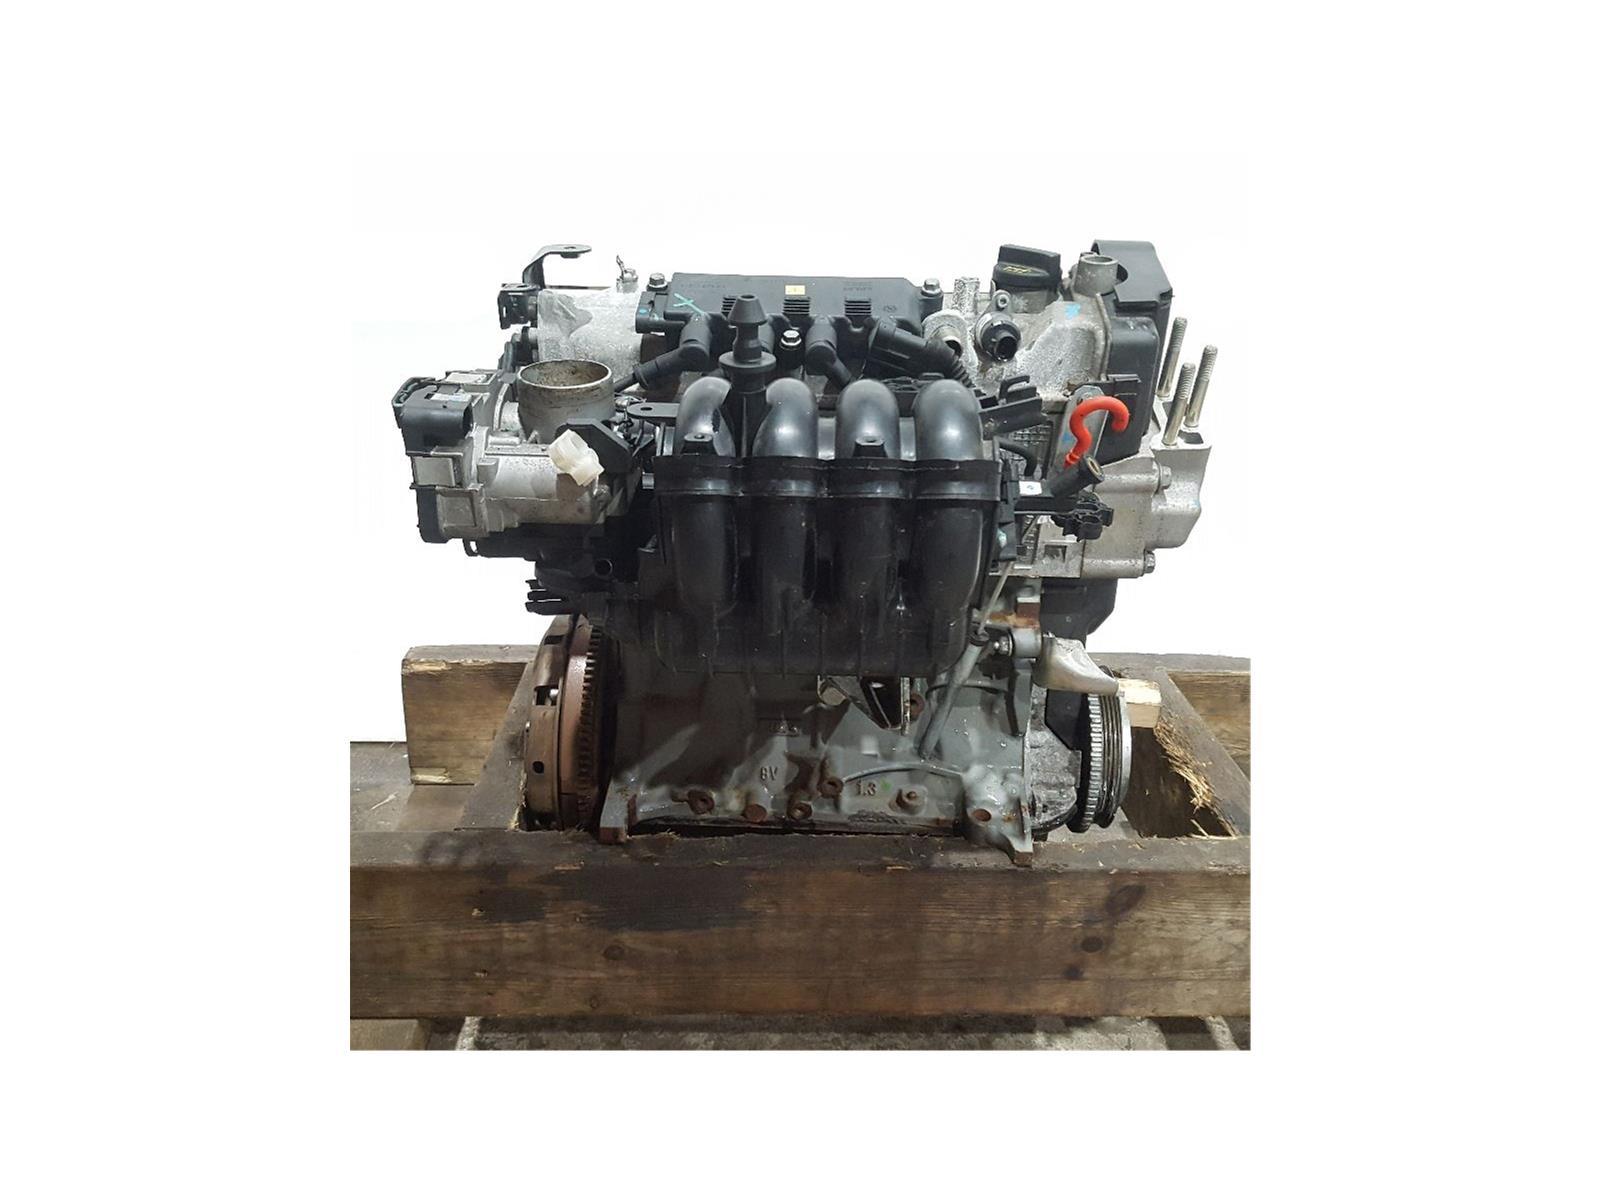 Fiat 500 2008 To 2015 1.2 Petrol Engine 169A4000